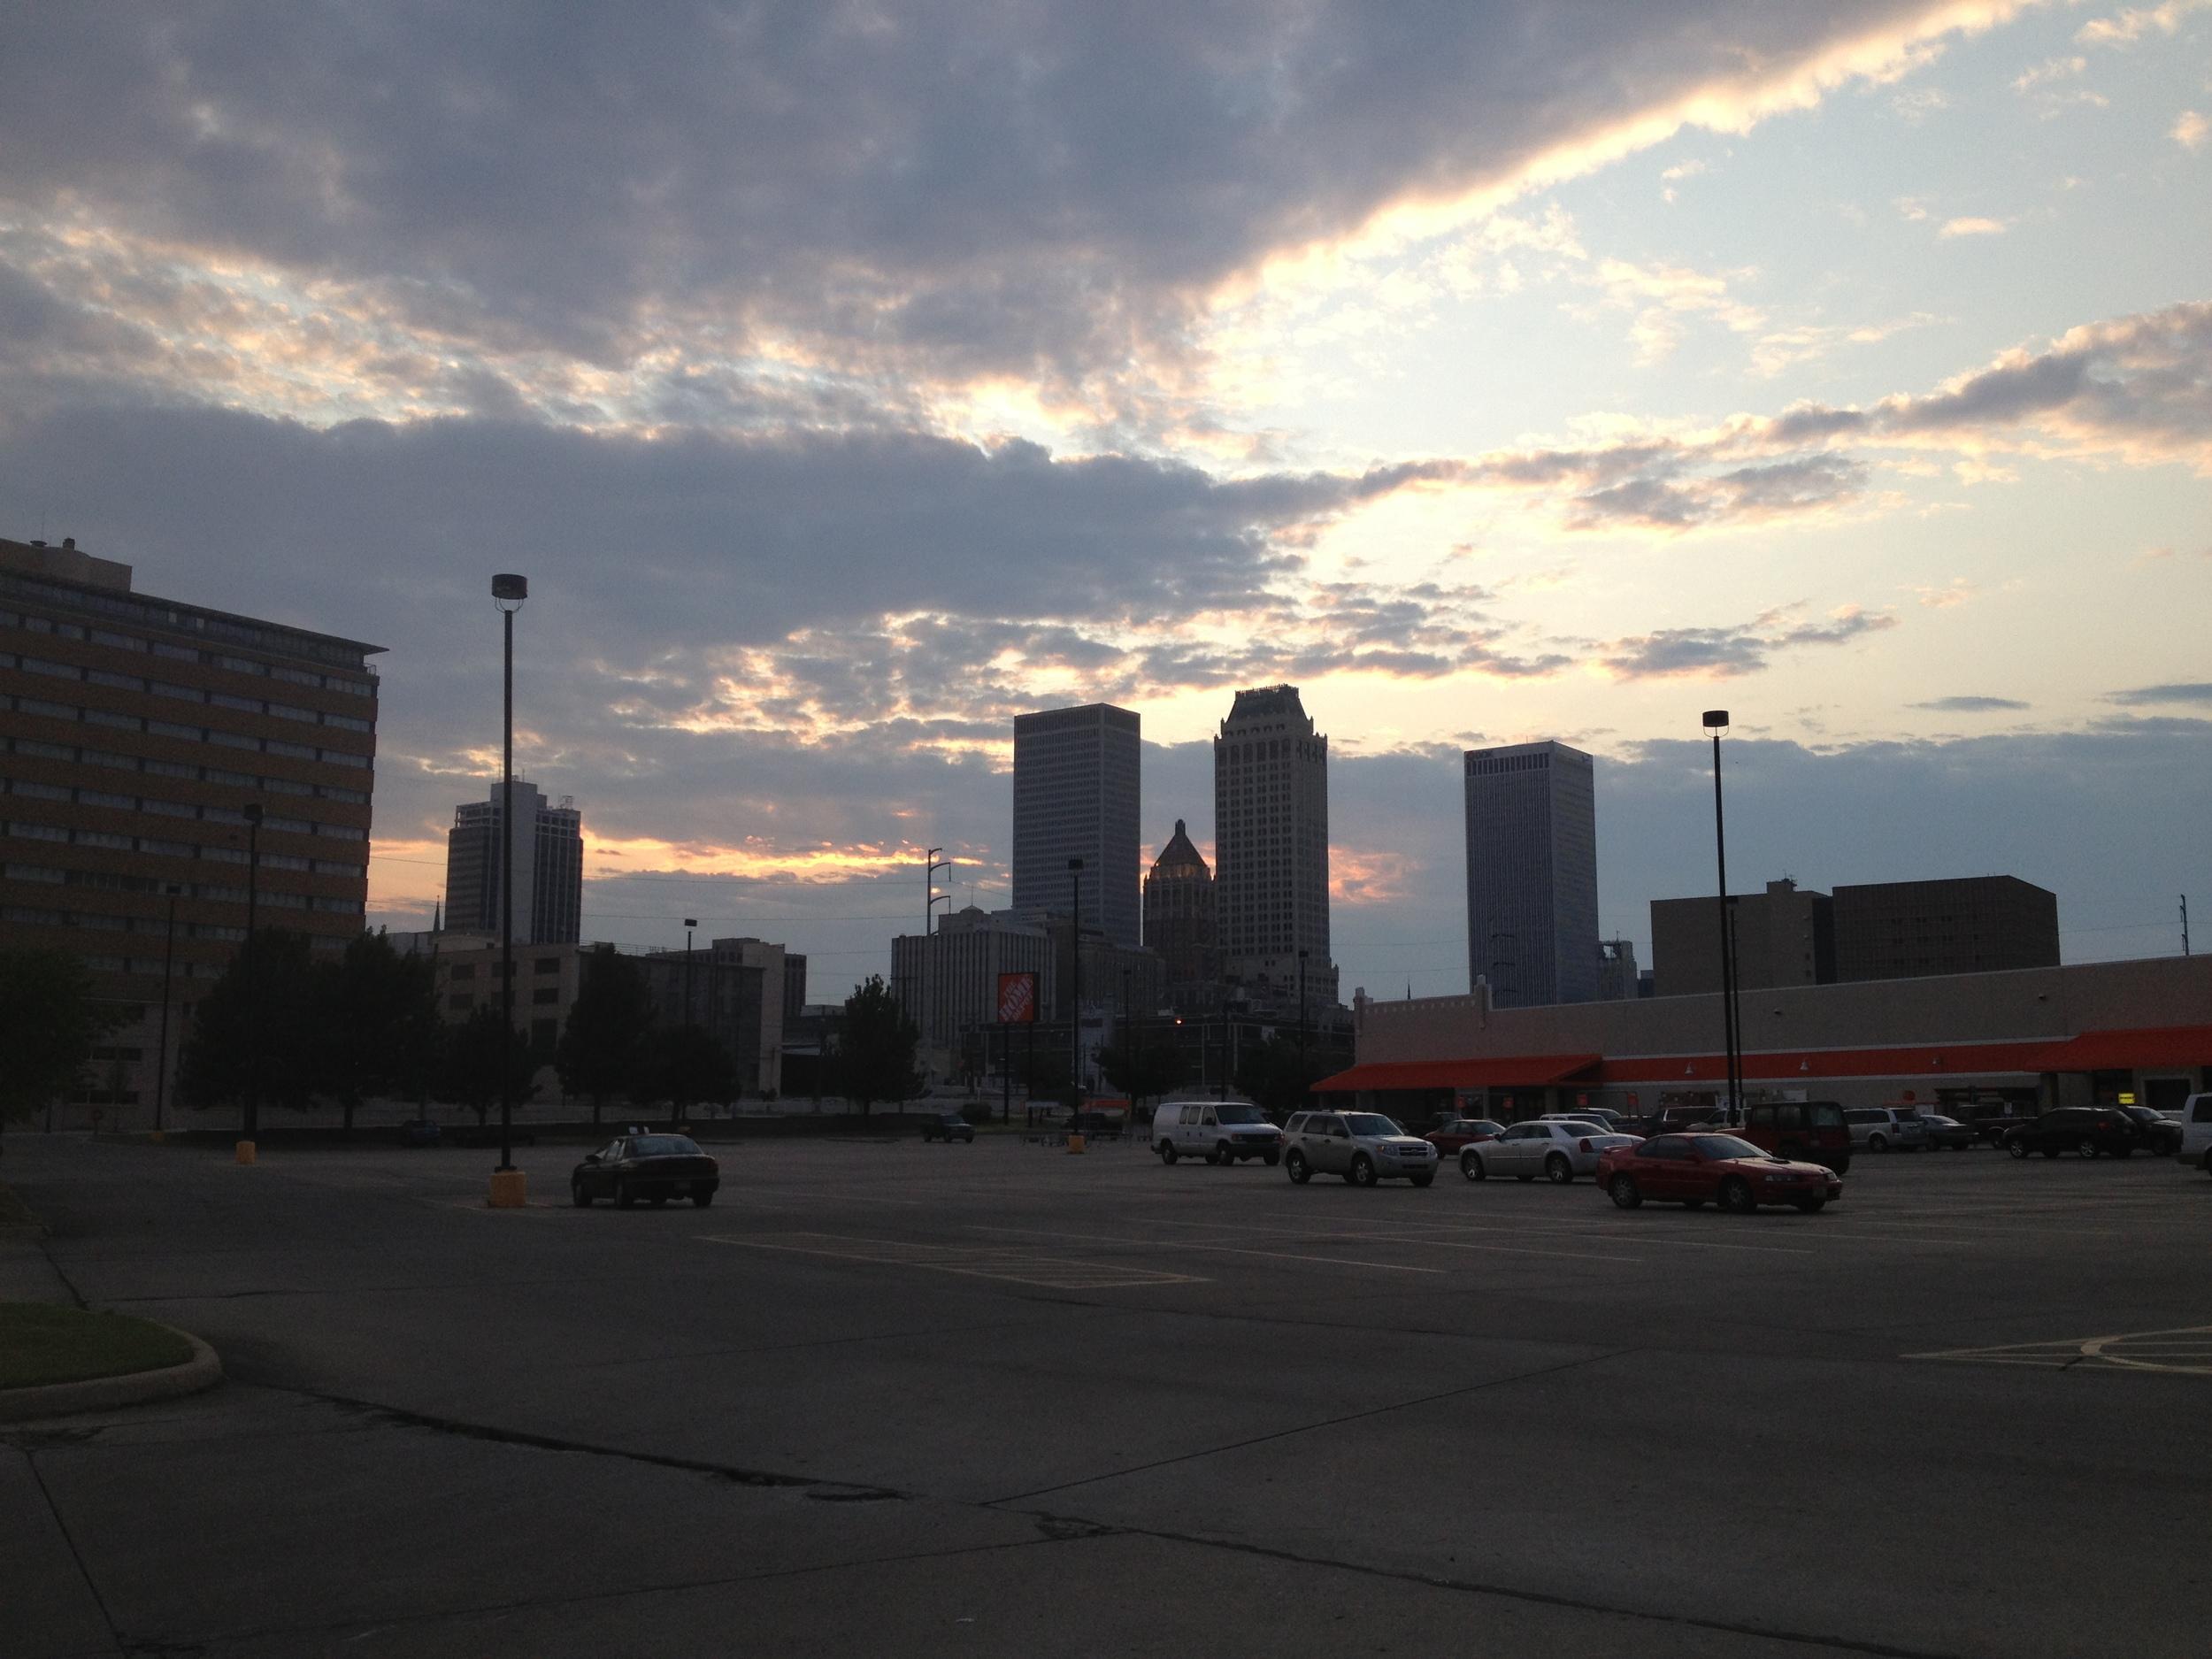 Downtown Tulsa, Oklahomat